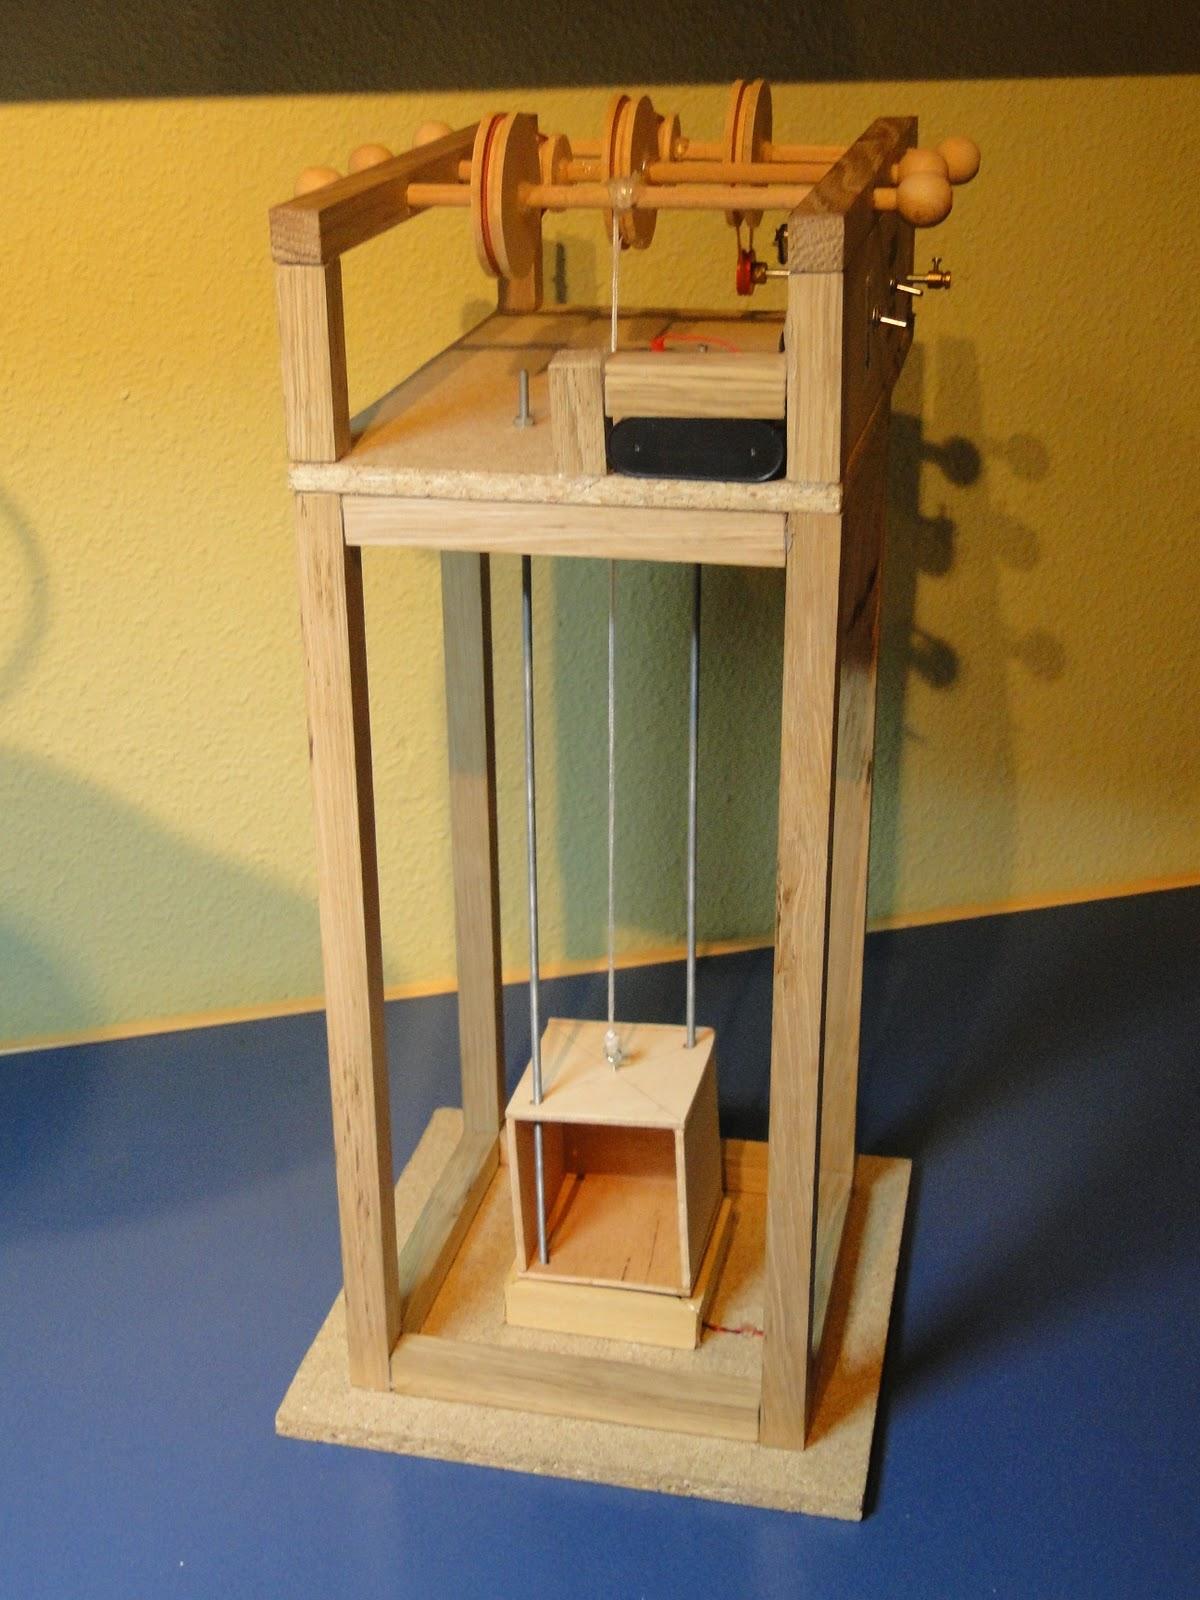 Proyectos tecno trictor ascensor de madera - Proyectos de madera ...